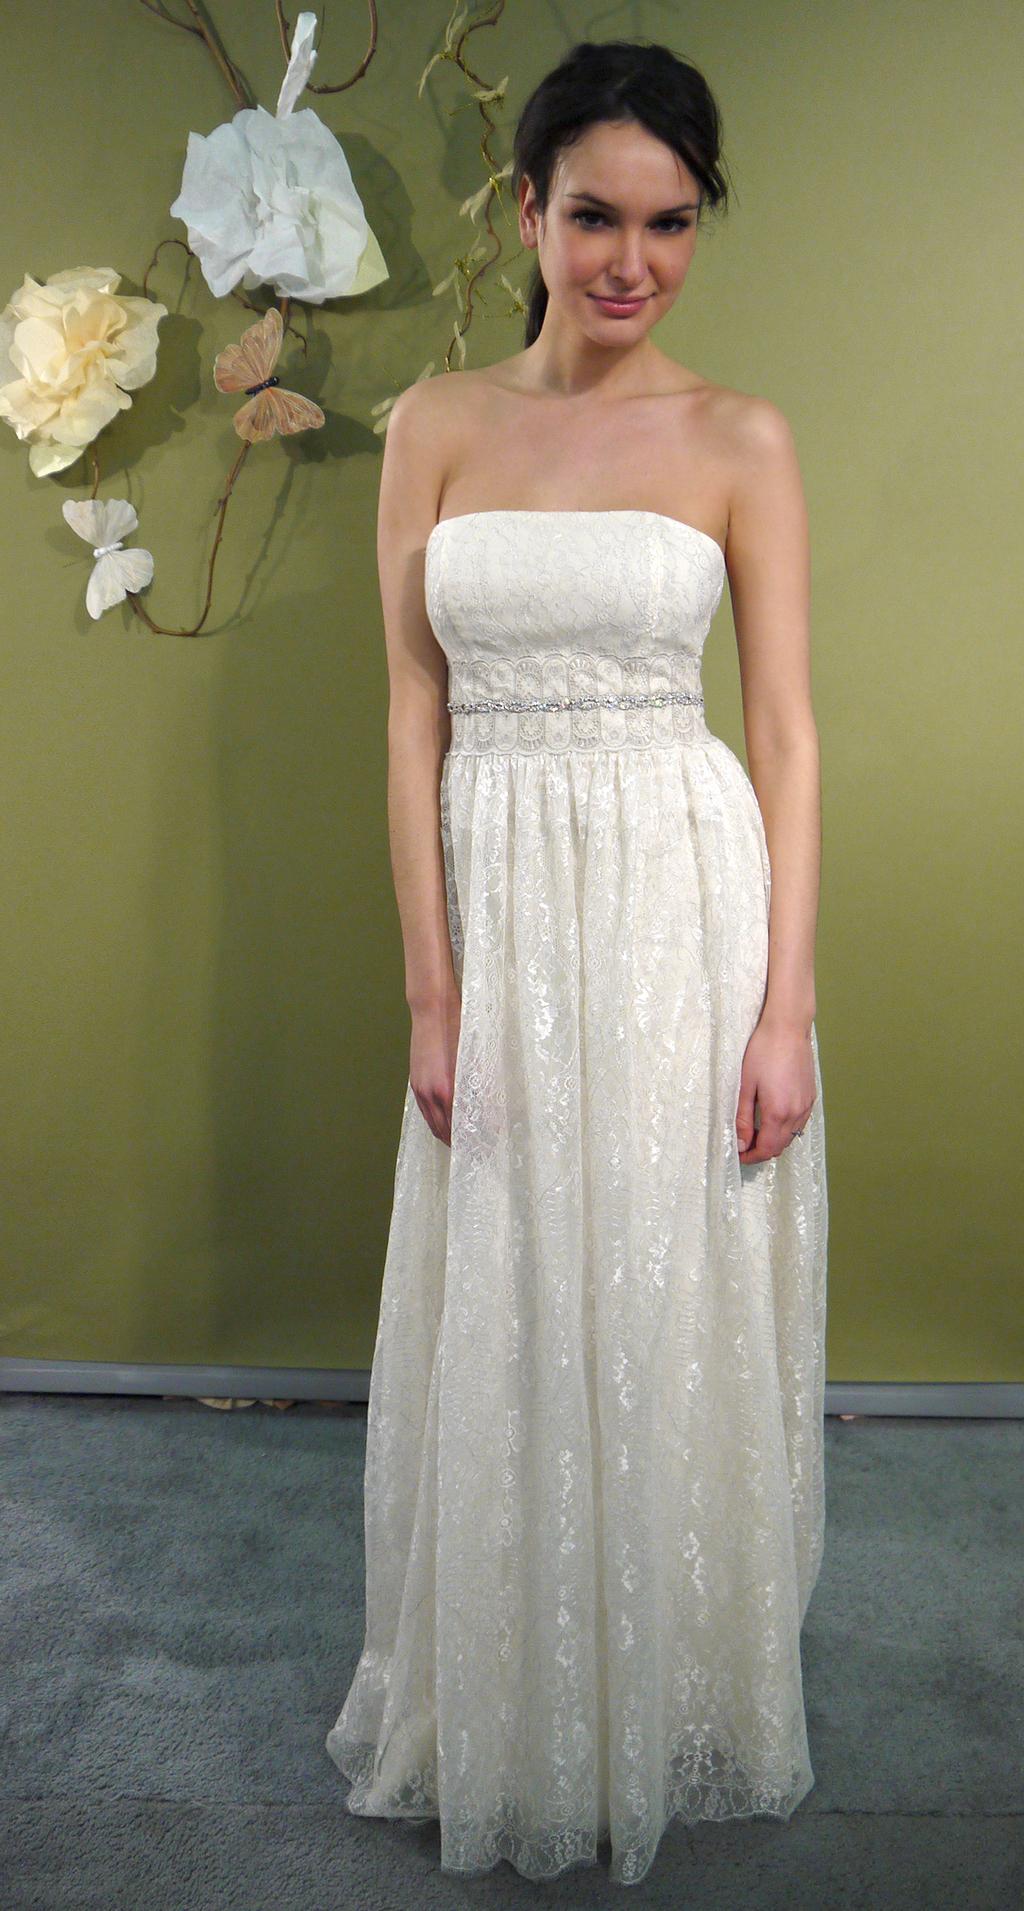 Fall-2011-wedding-dresses-norah-strapless-empire-wedding-dress-beaded-bridal-belt-claire-pettibone-lace-large.full